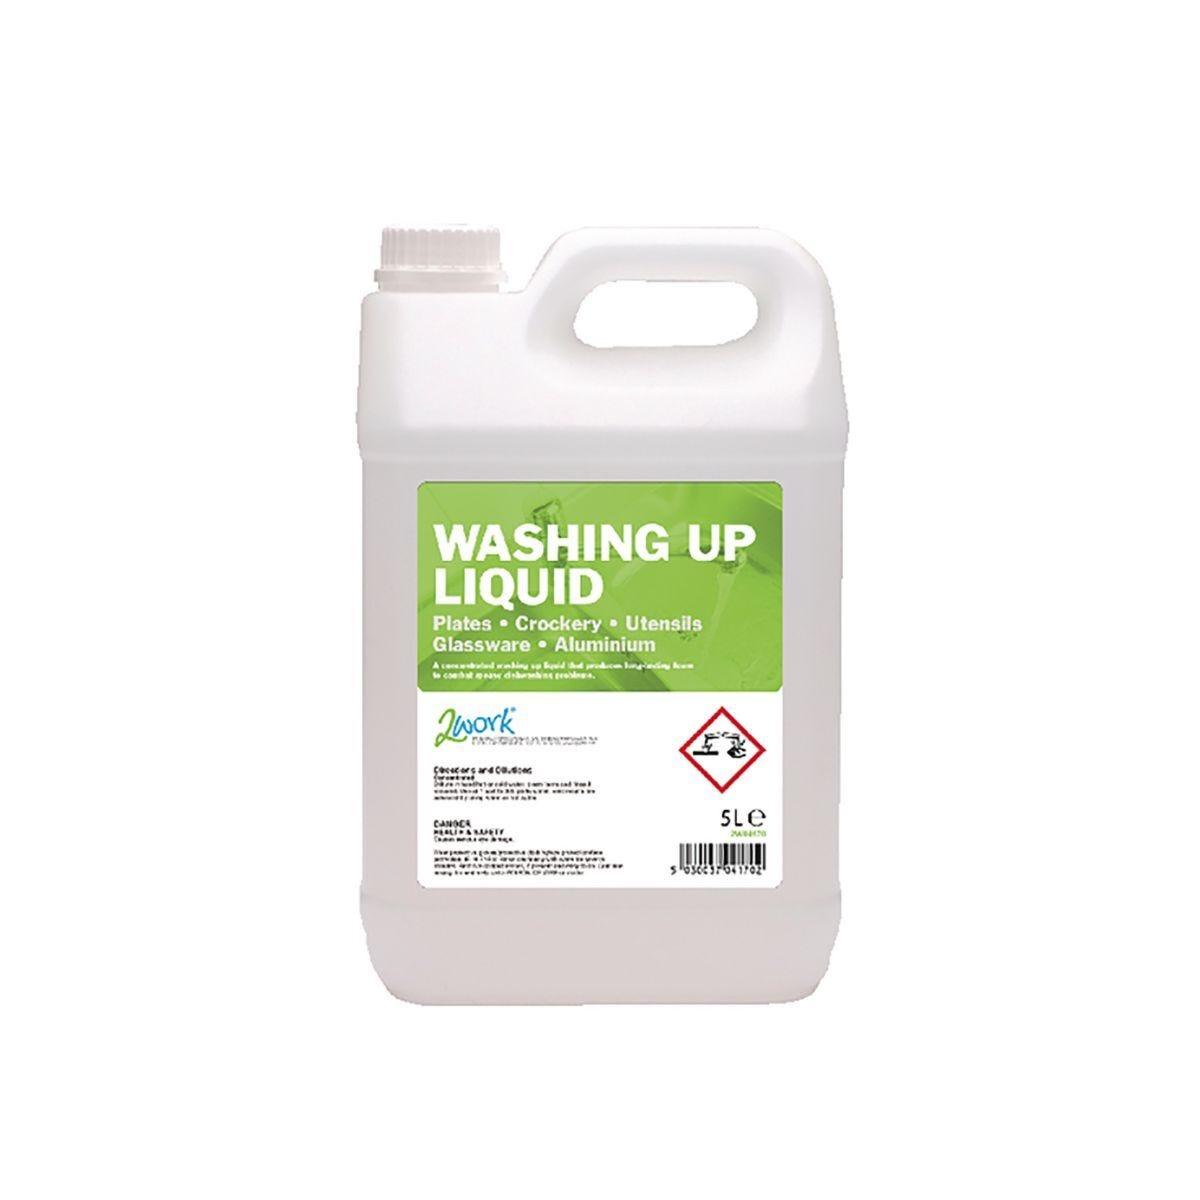 2Work Economy Washing Up Liquid 5 Litre